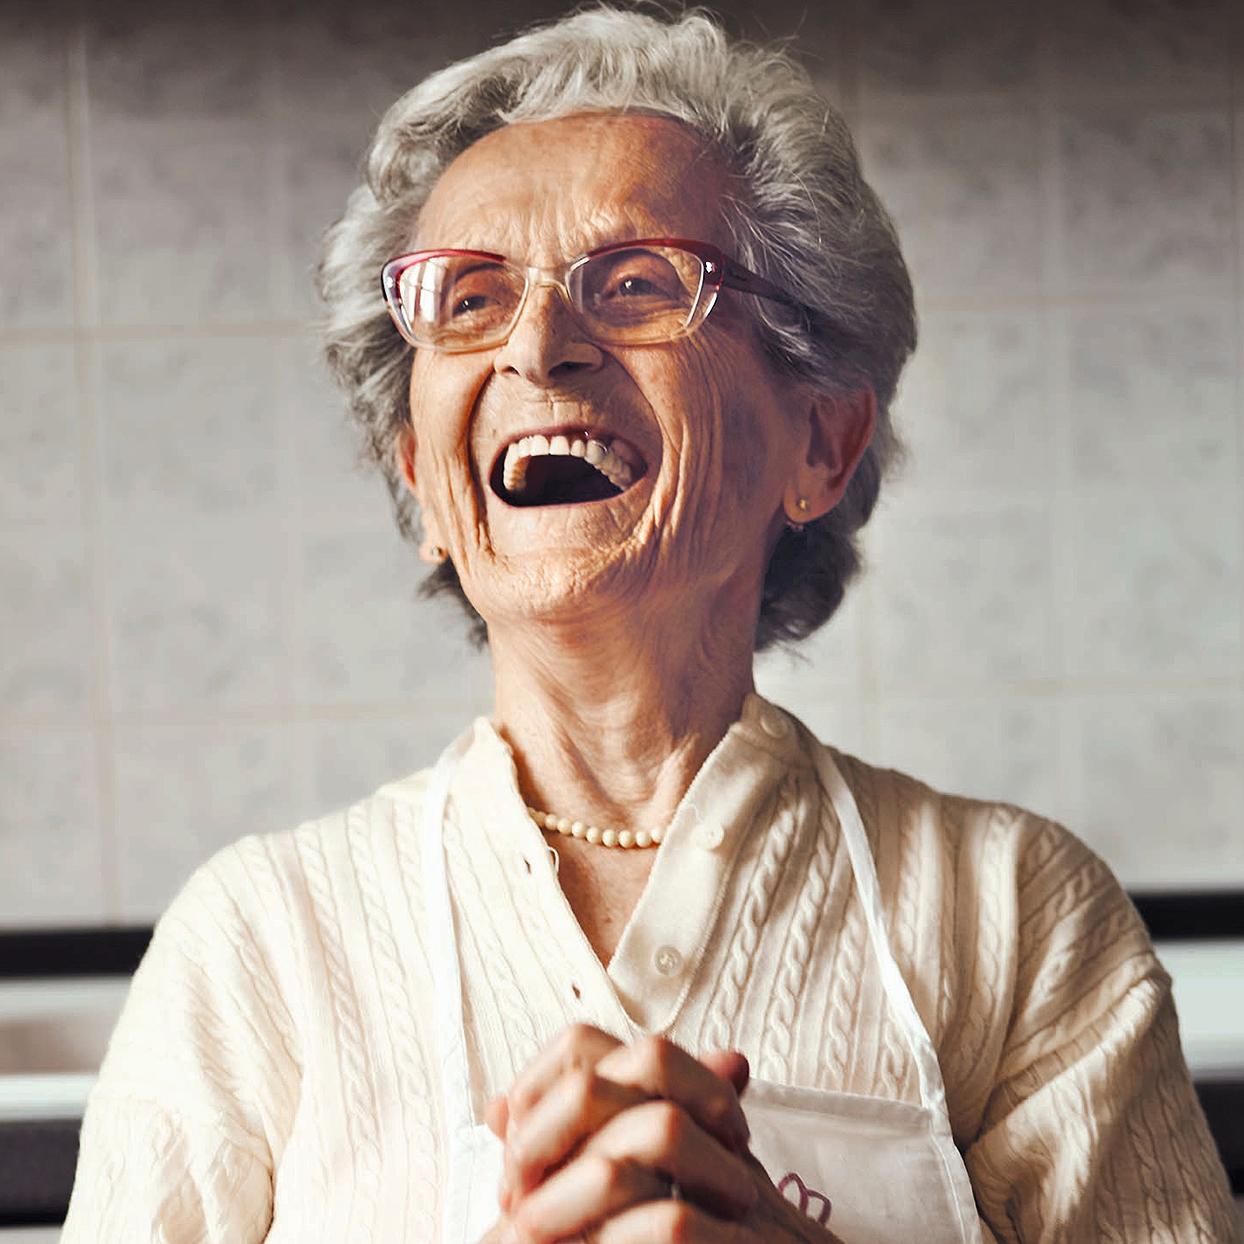 elderly woman smile pearl necklace cat-eye glasses apron kitchen